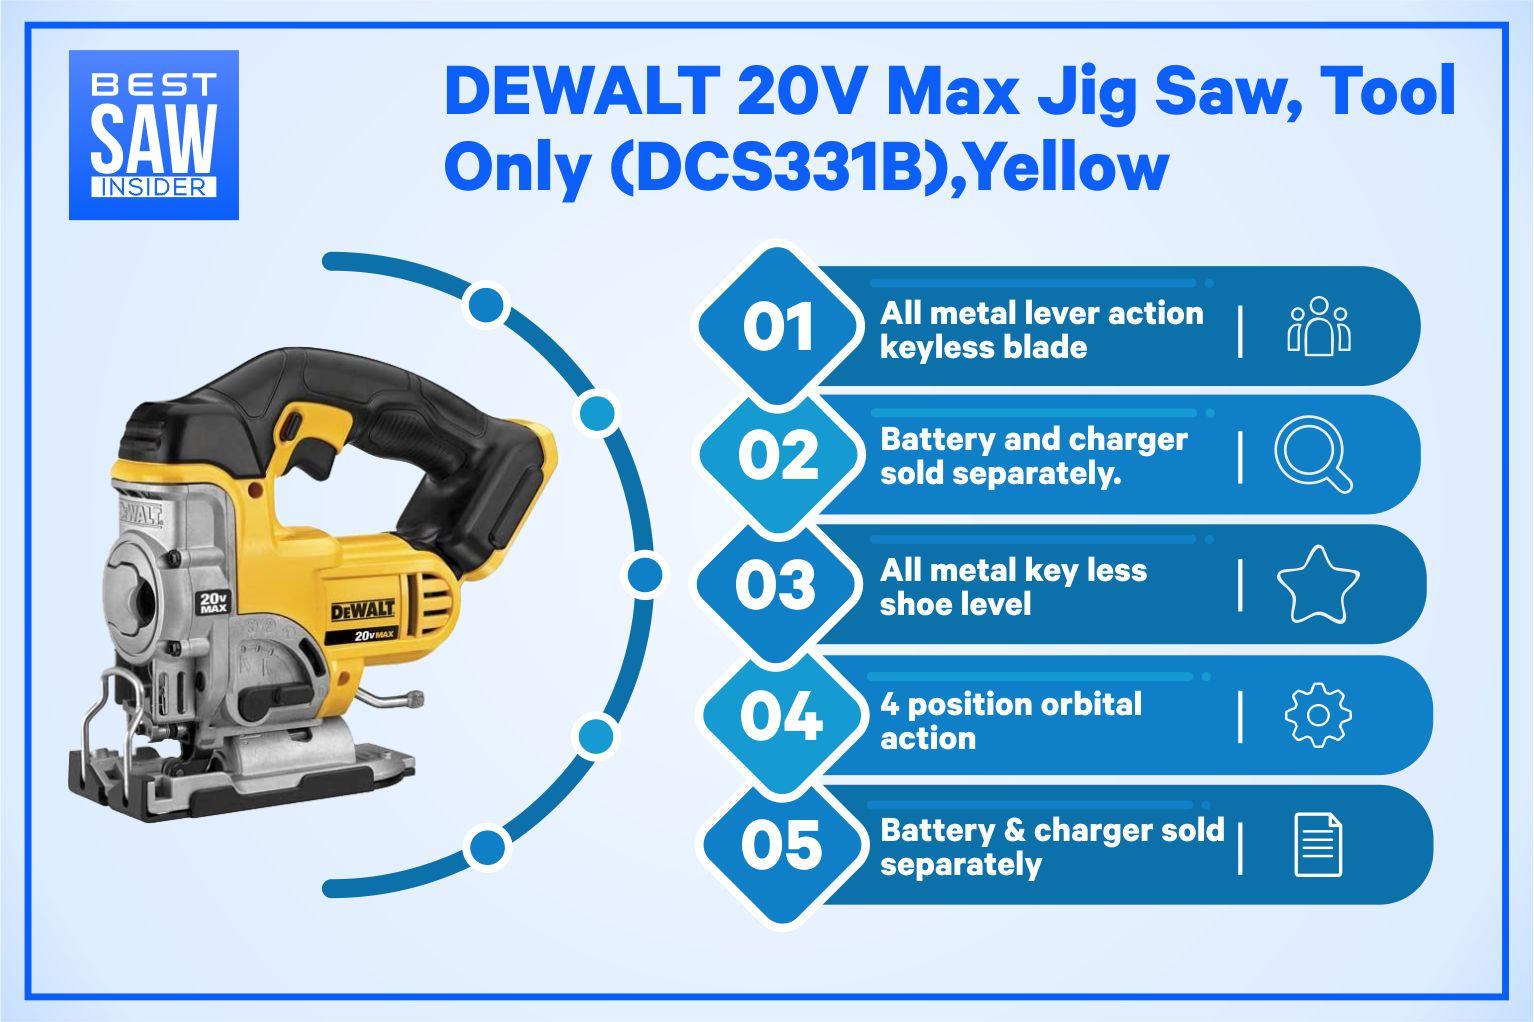 DeWalt DCS331B 20V Cordless JigSaw infographic